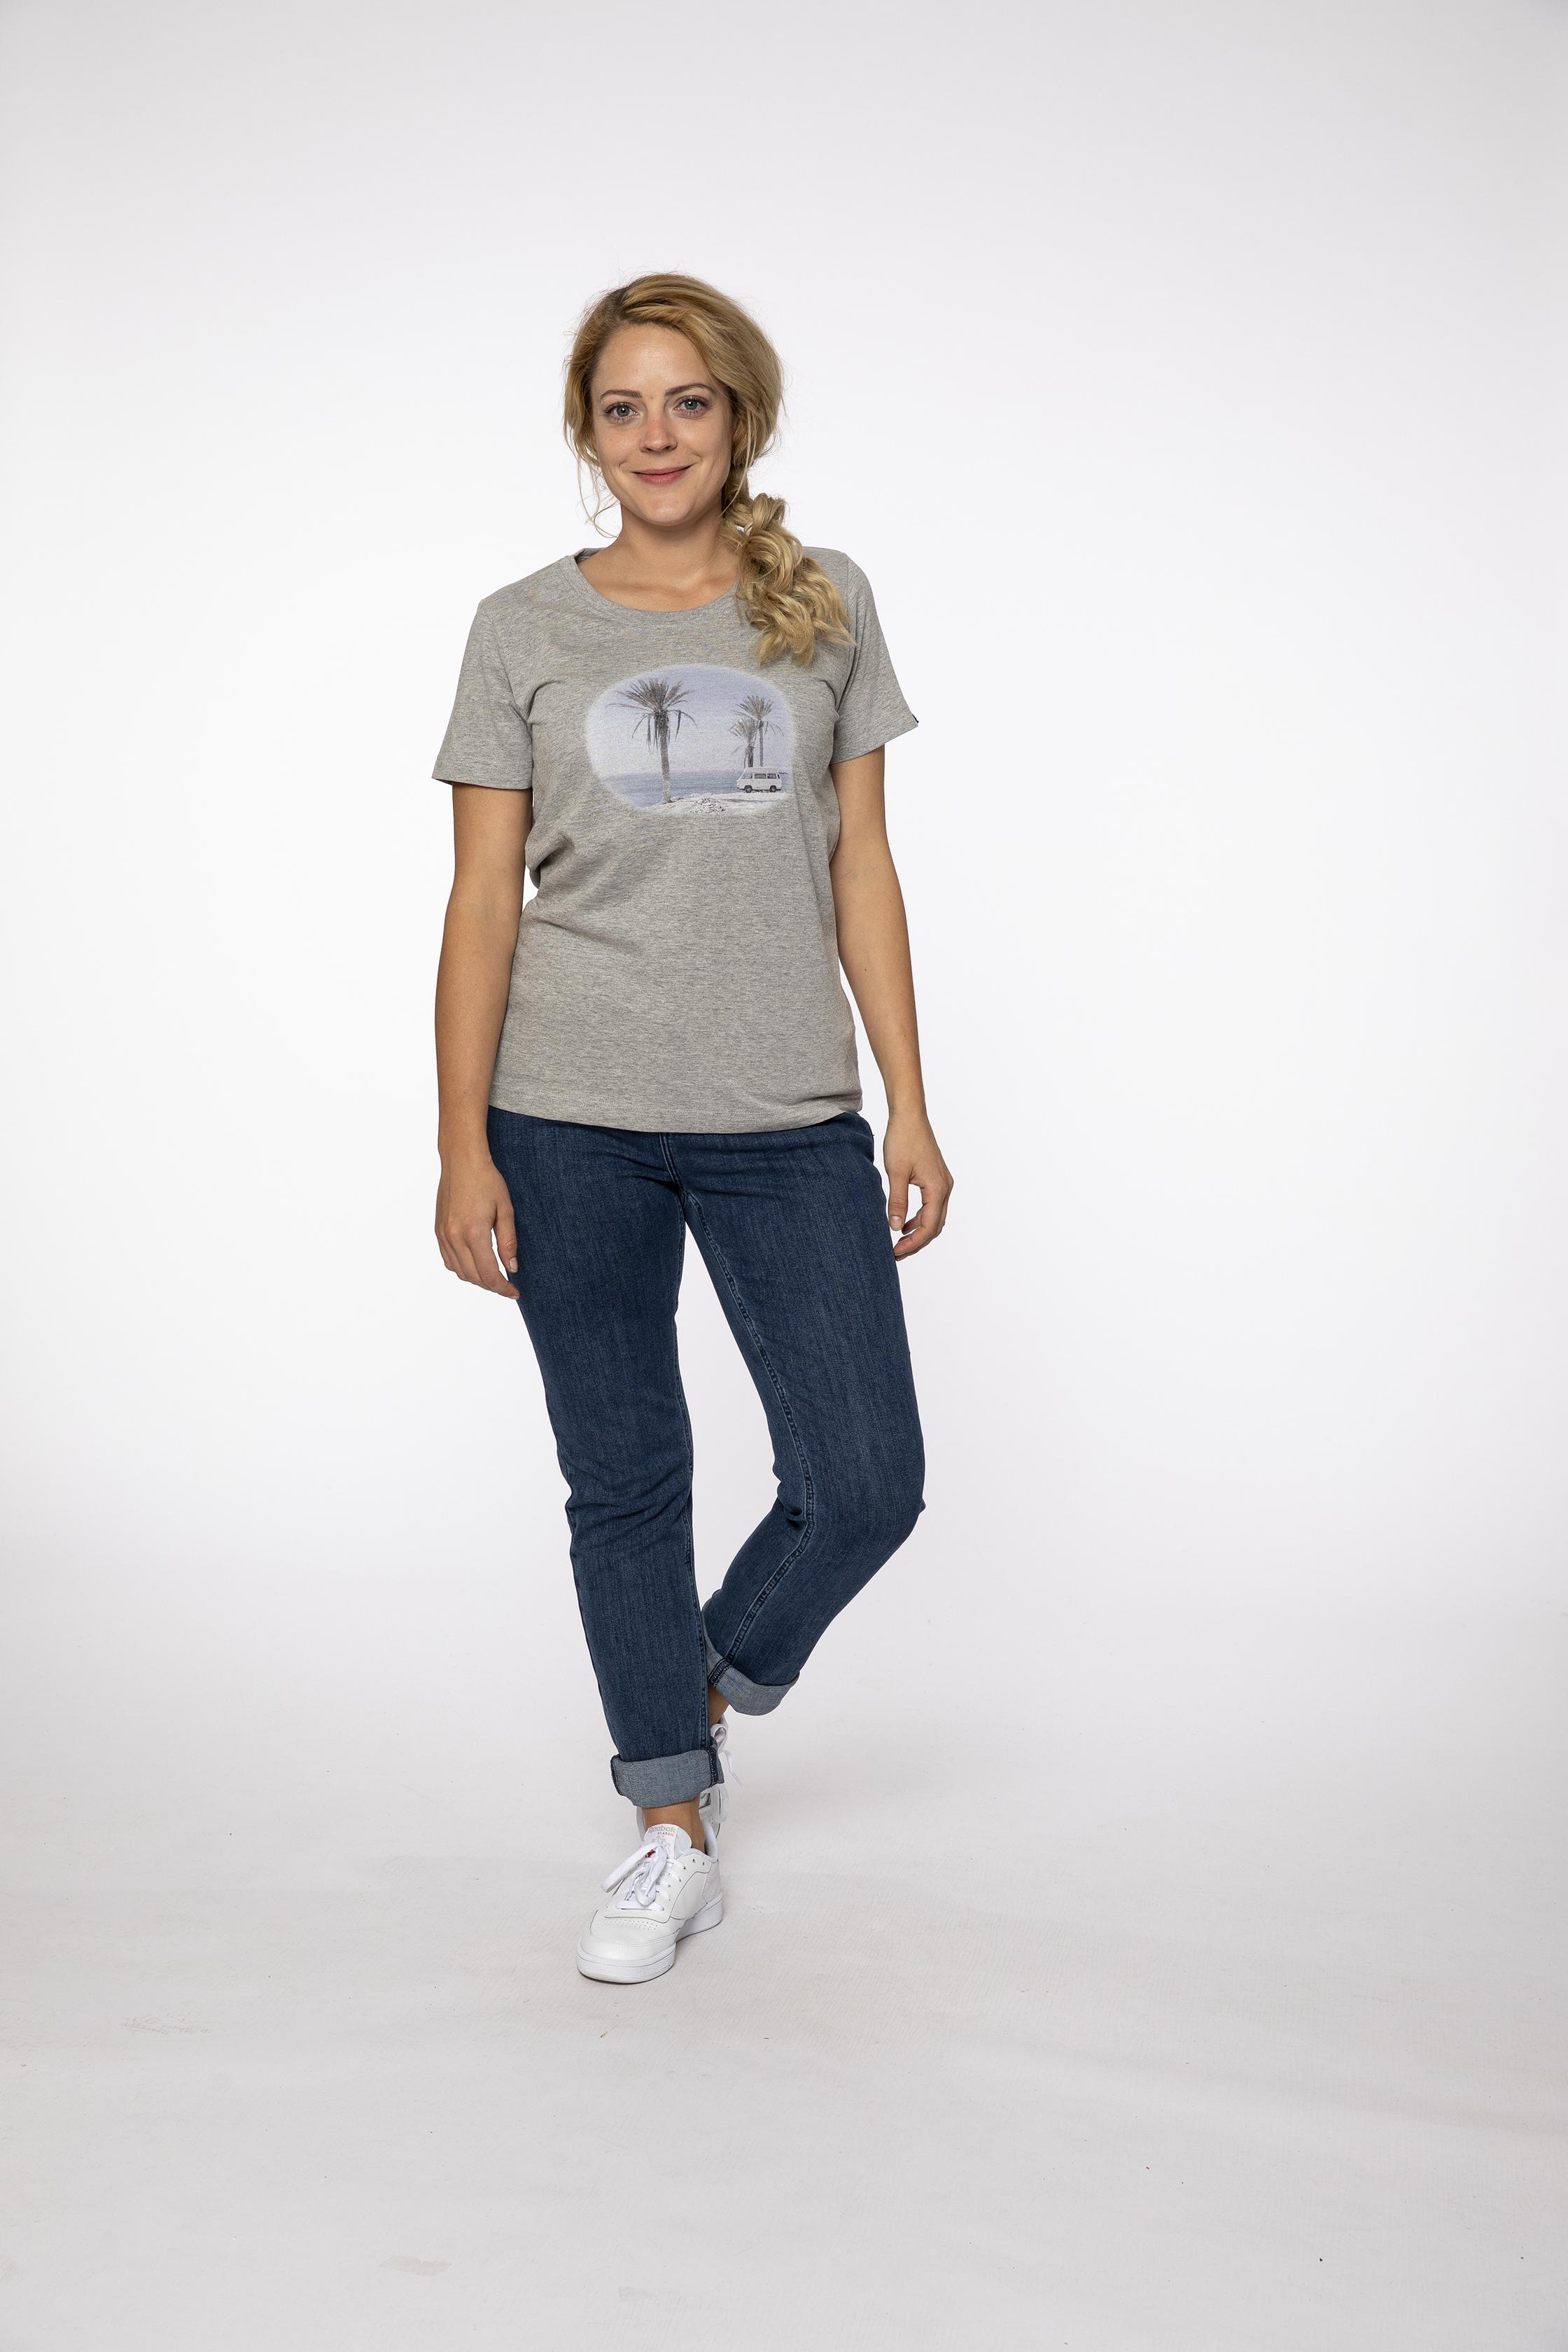 t-shirt:  INMYMIND   pants:  BLUEMOON